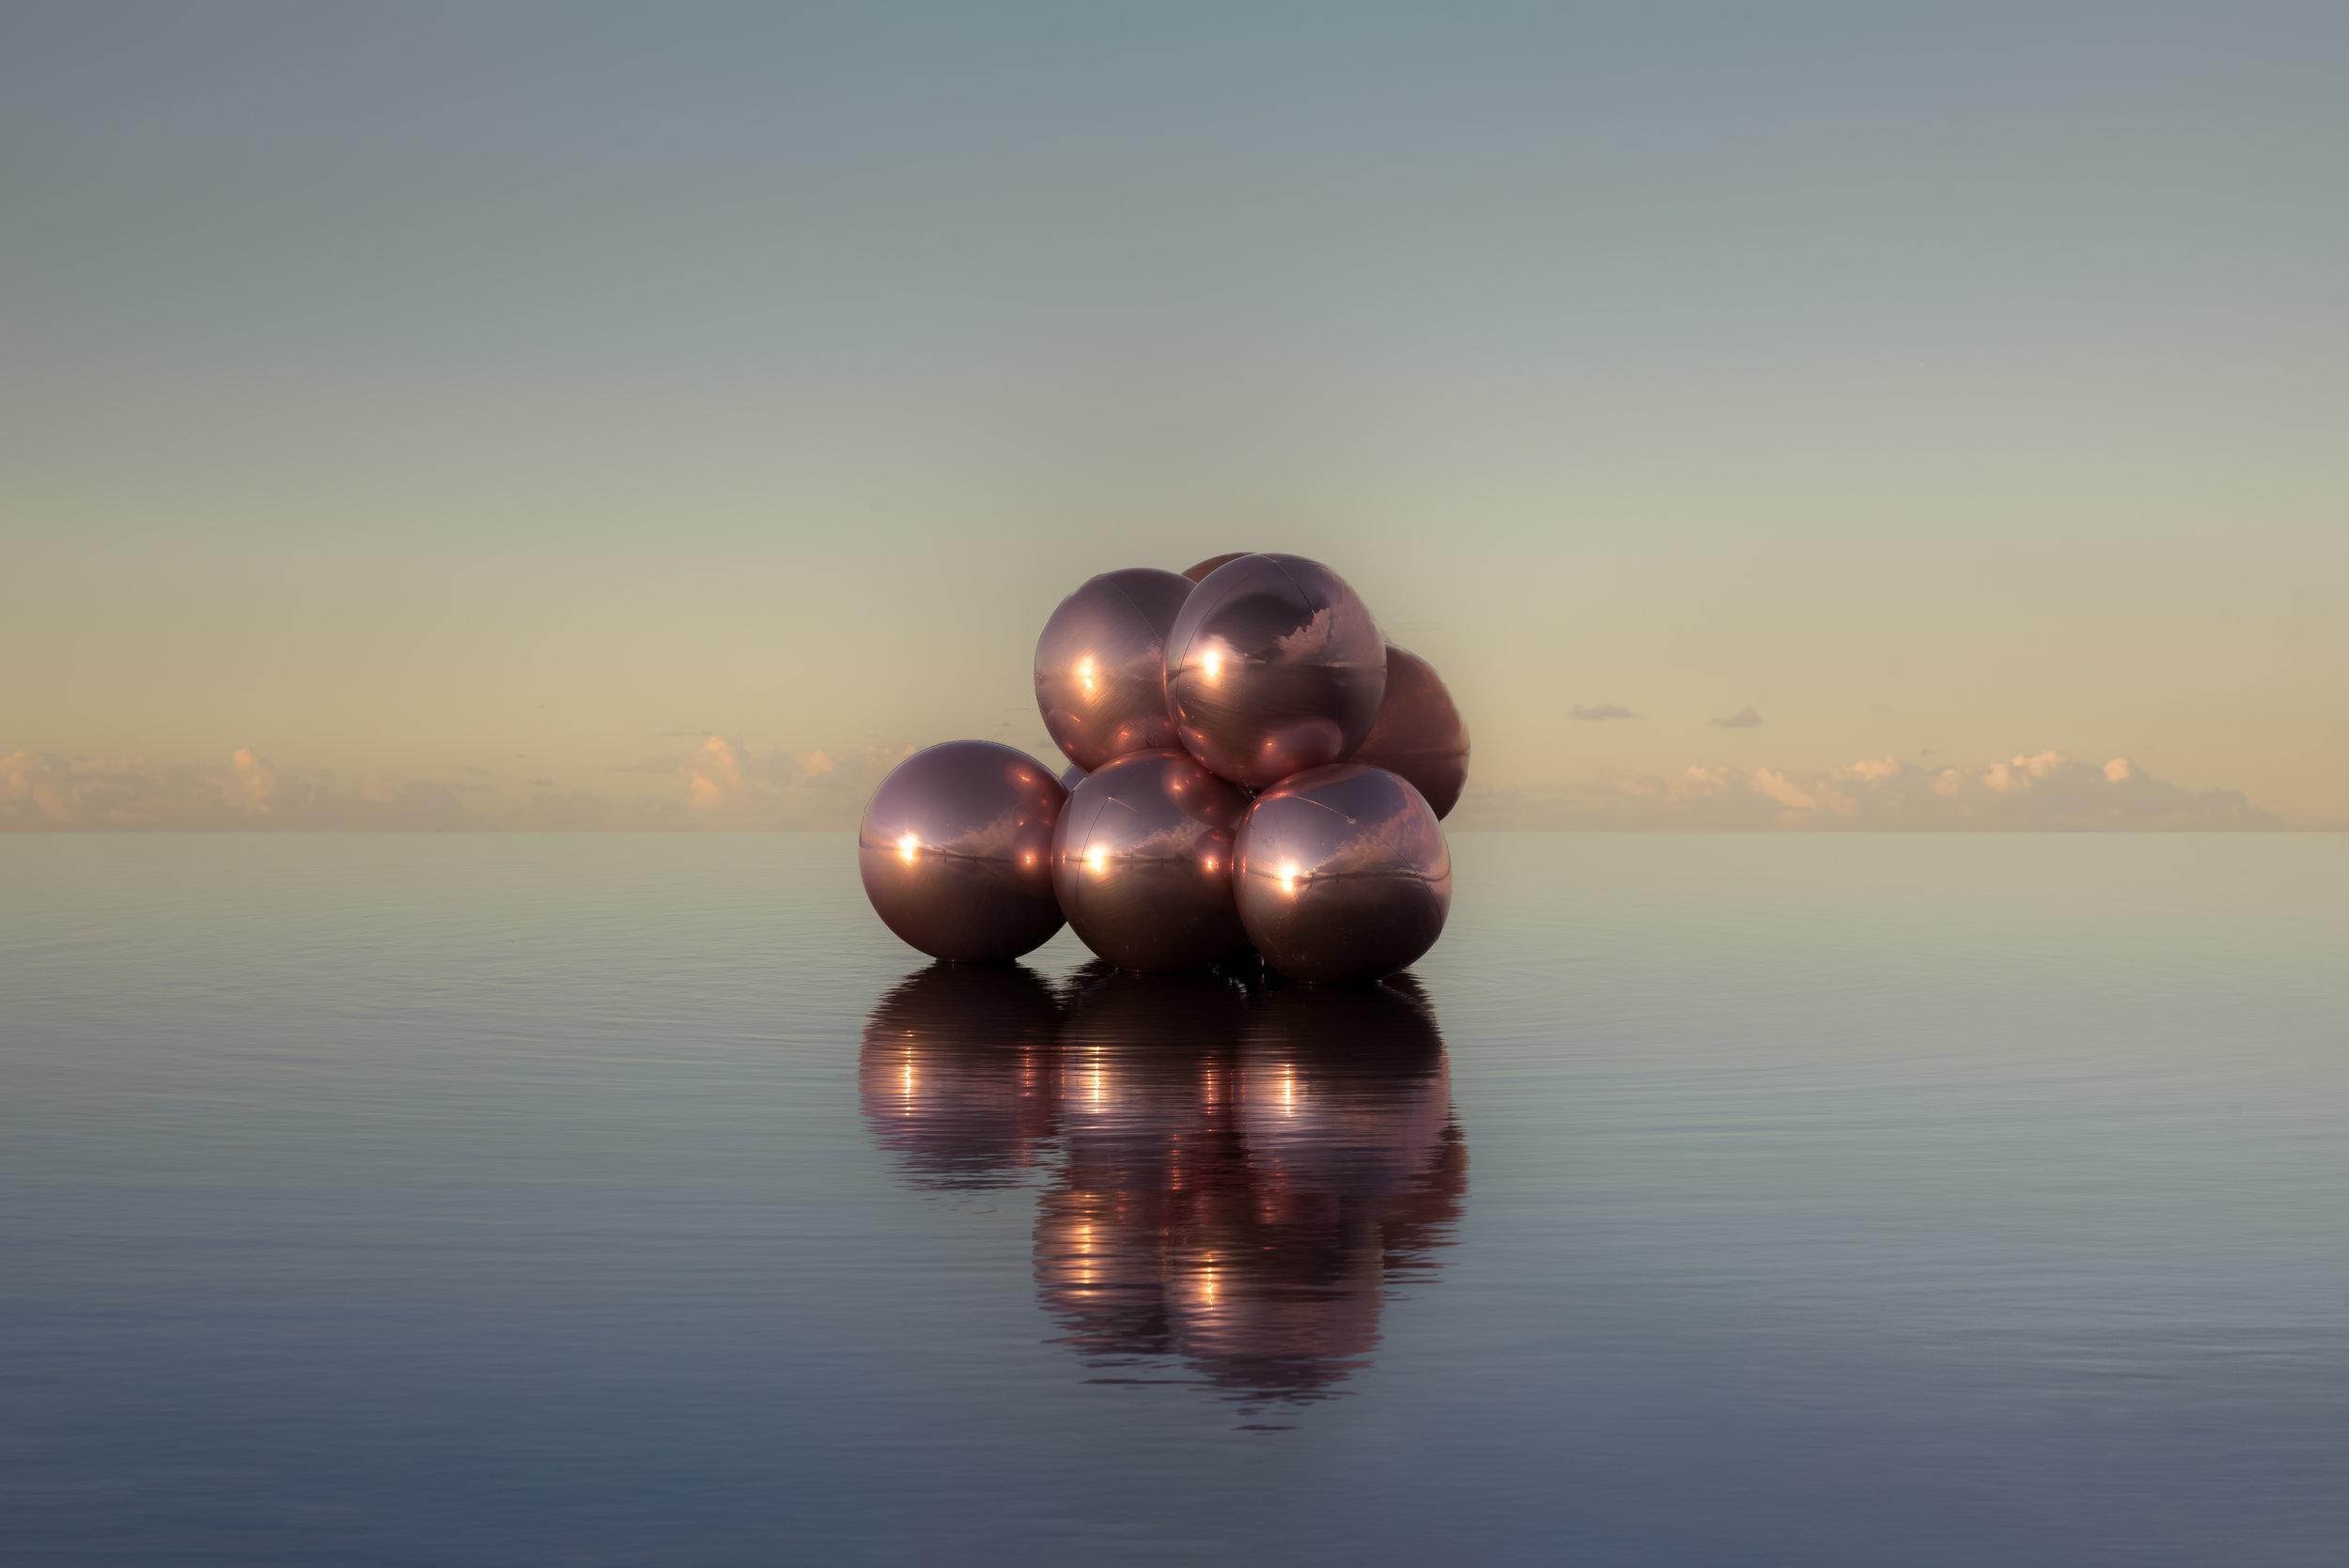 balloons_update-1.jpg